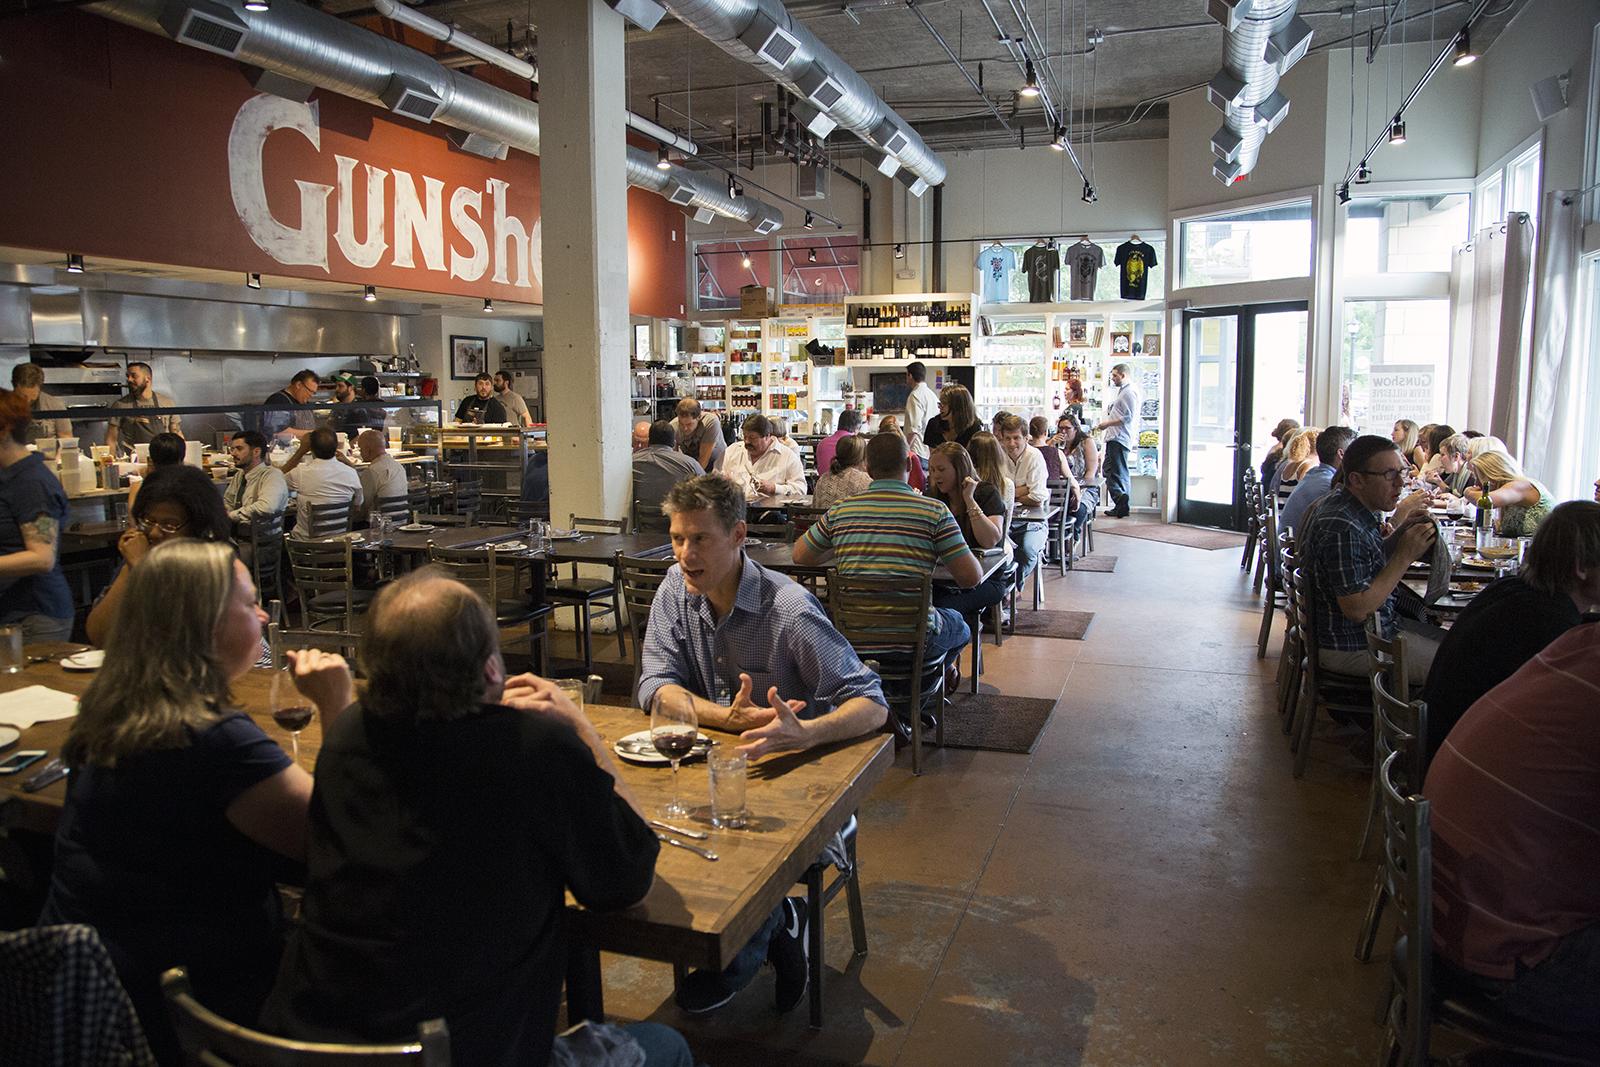 Top Chef Kevin Gillespie Announces a New Leader for Flagship Restaurant, Gunshow